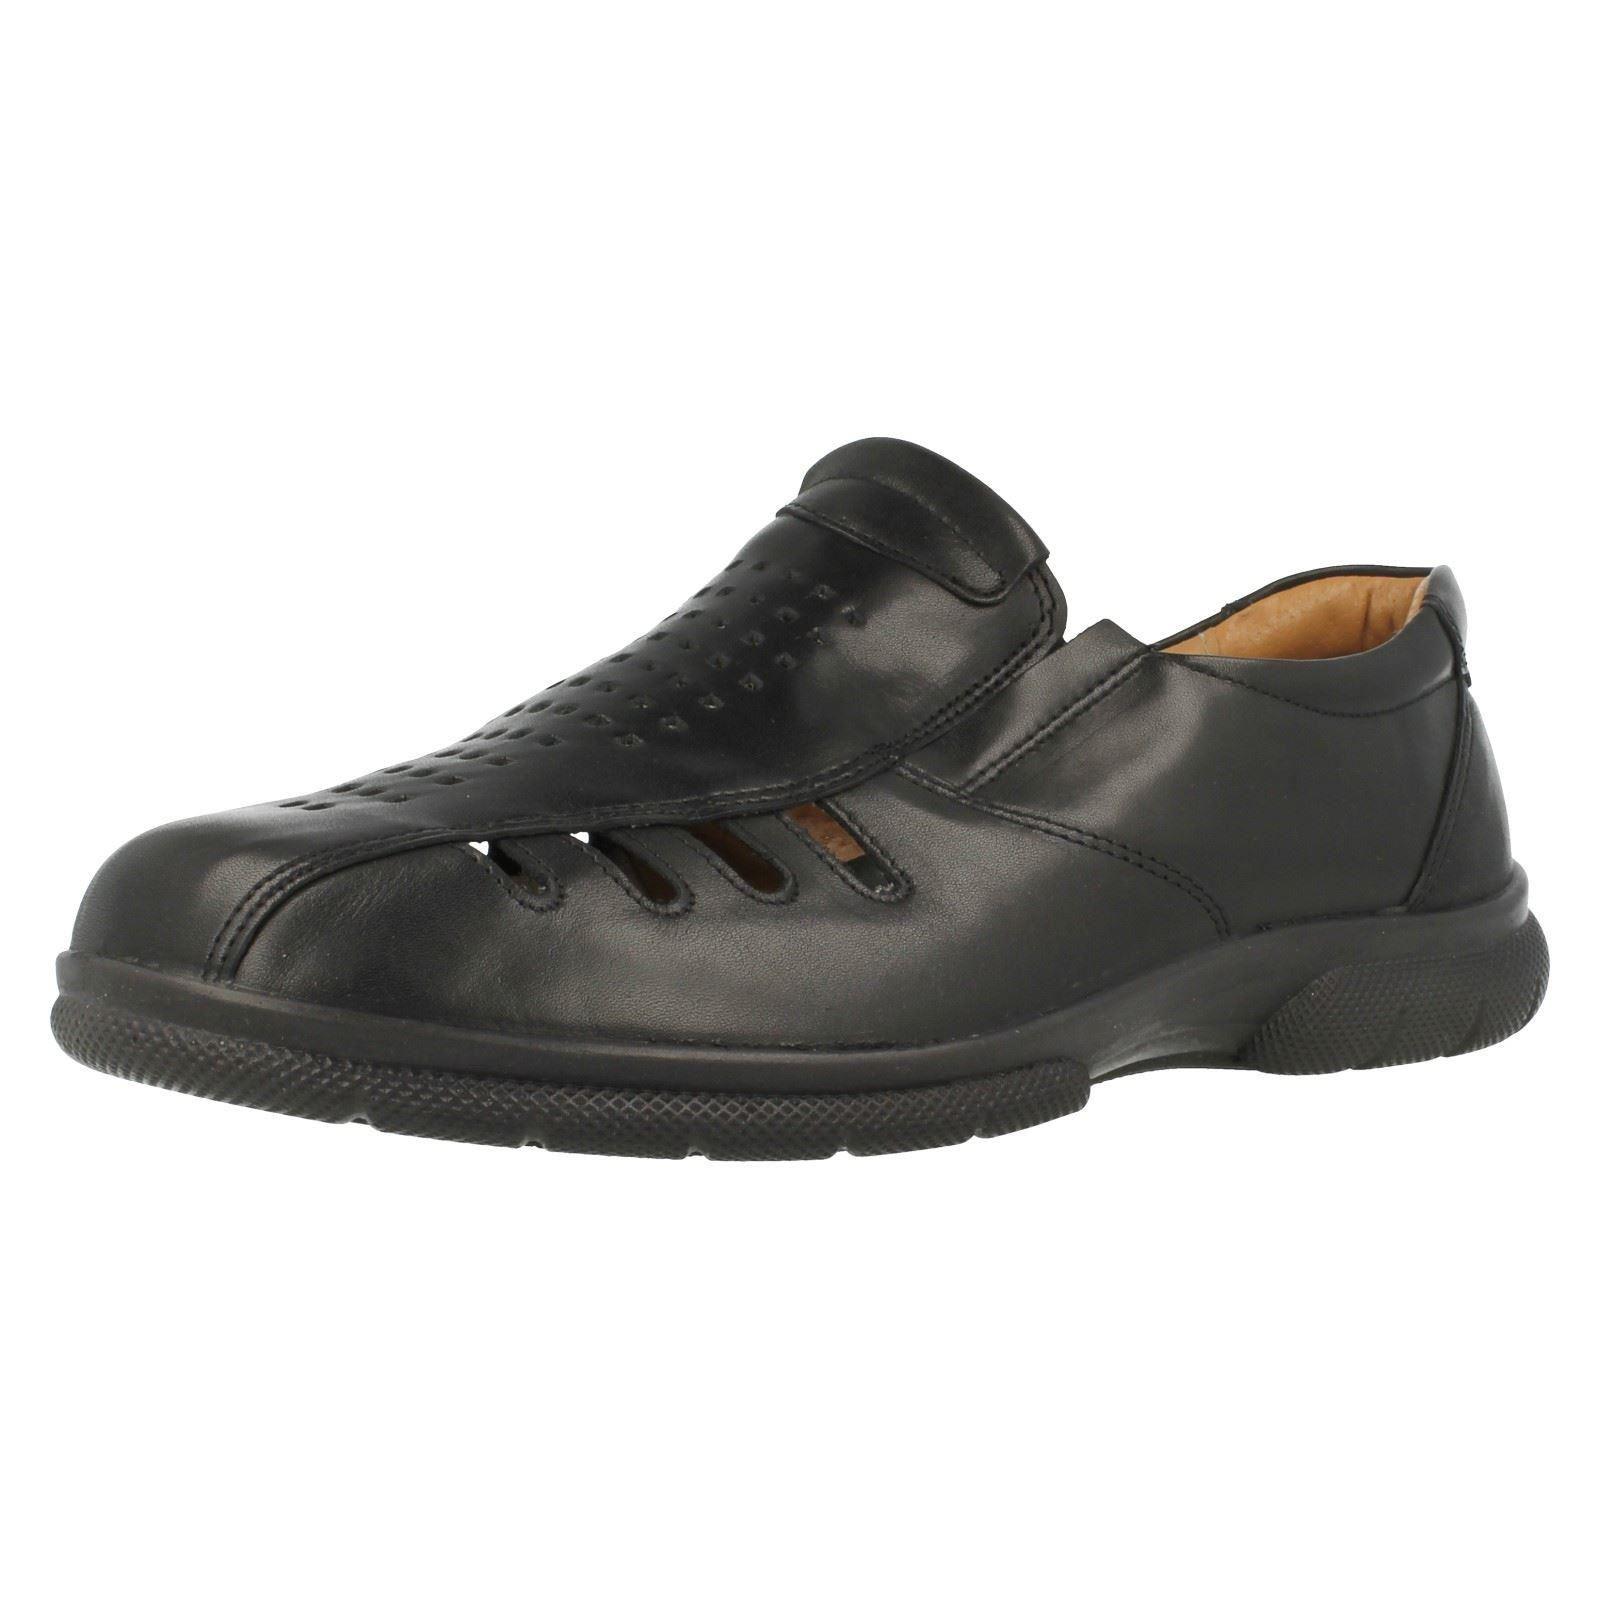 Sketchers Mens Extra Wtde Shoes